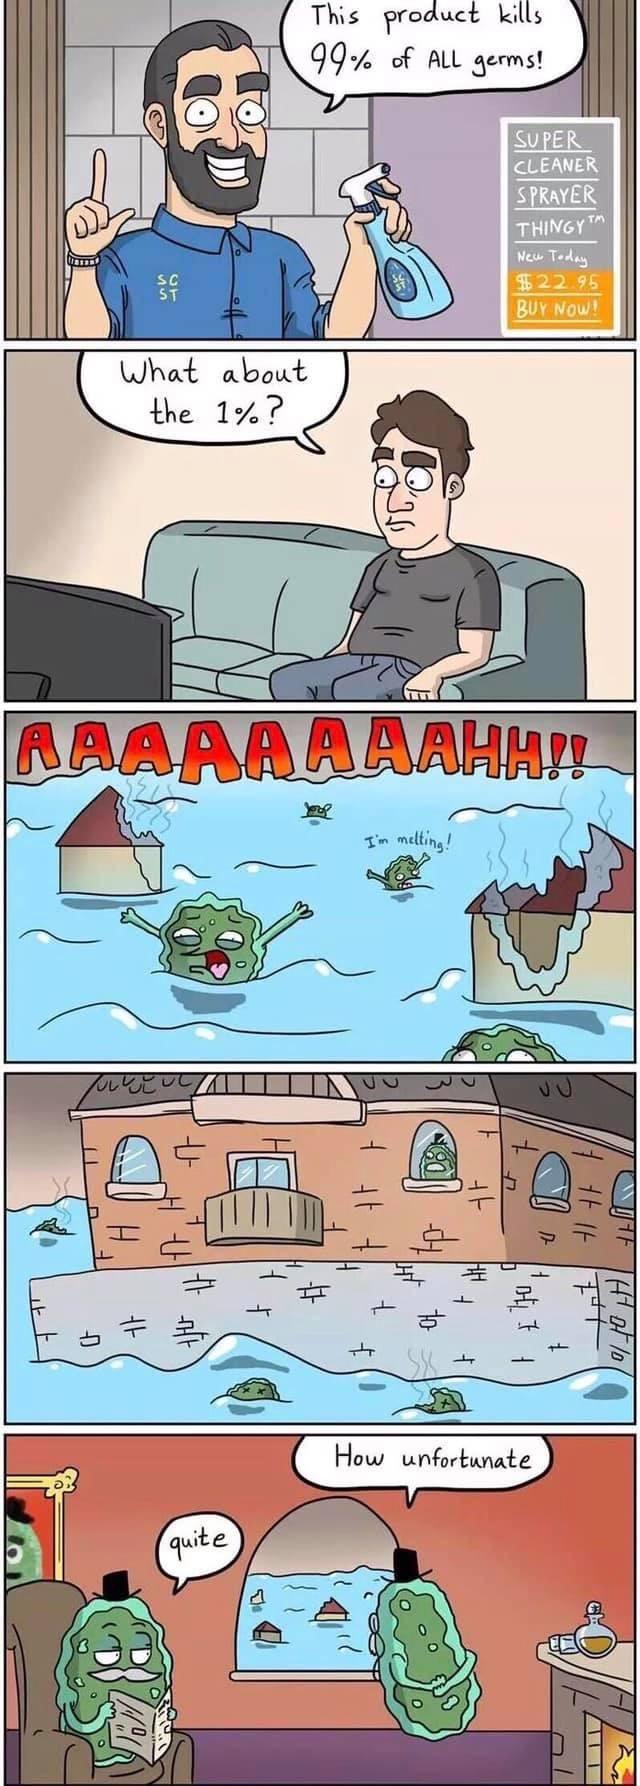 Boujie bugs